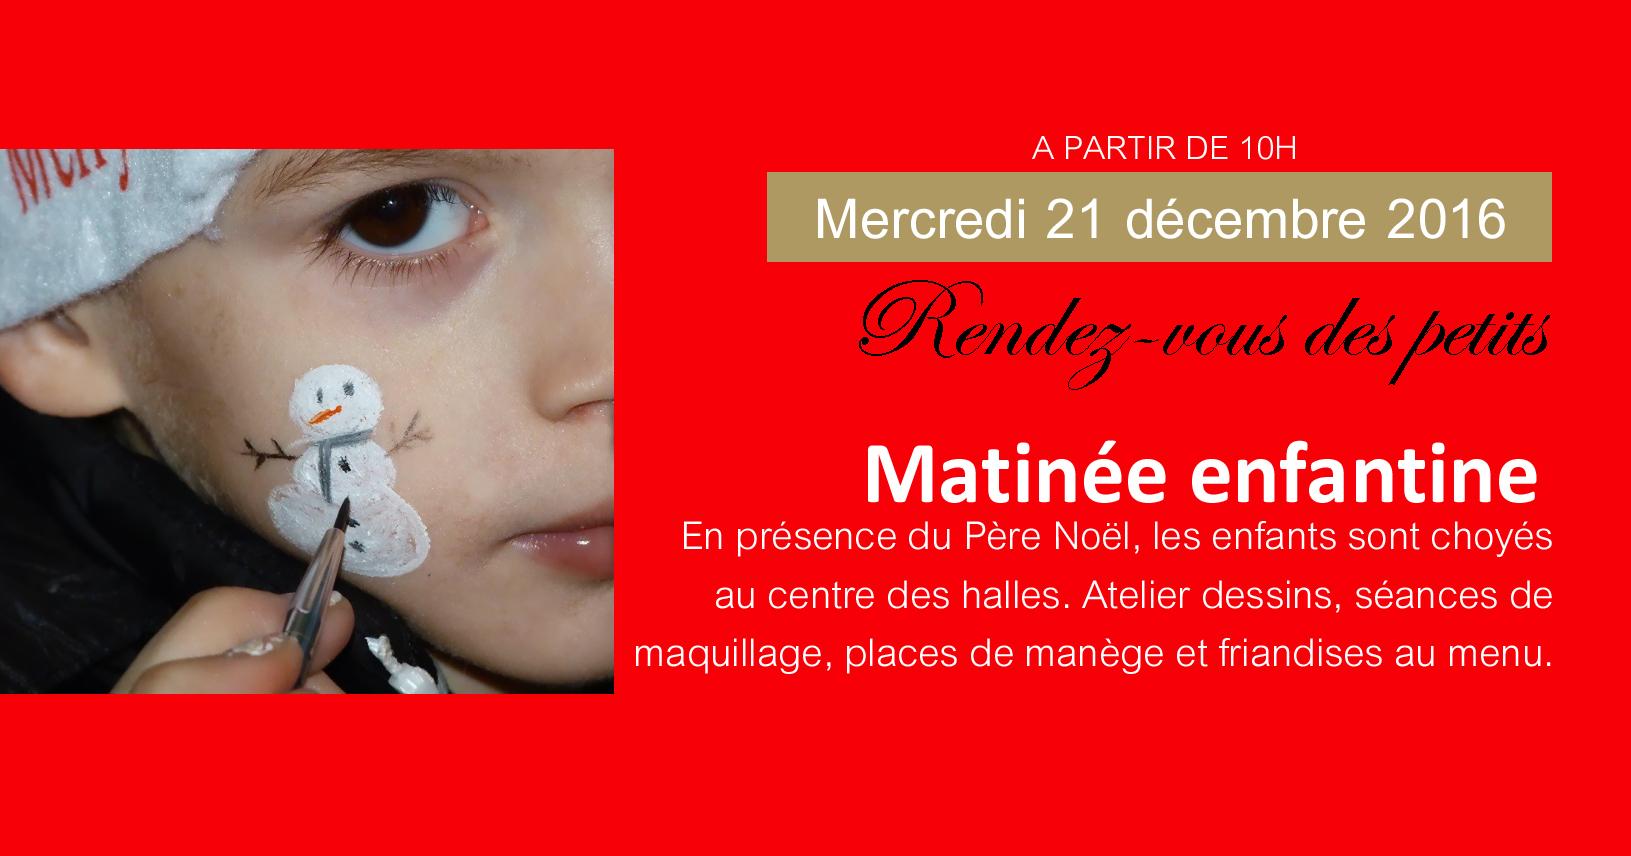 halles_narbonne_animation_matinee-_enfantine_2016